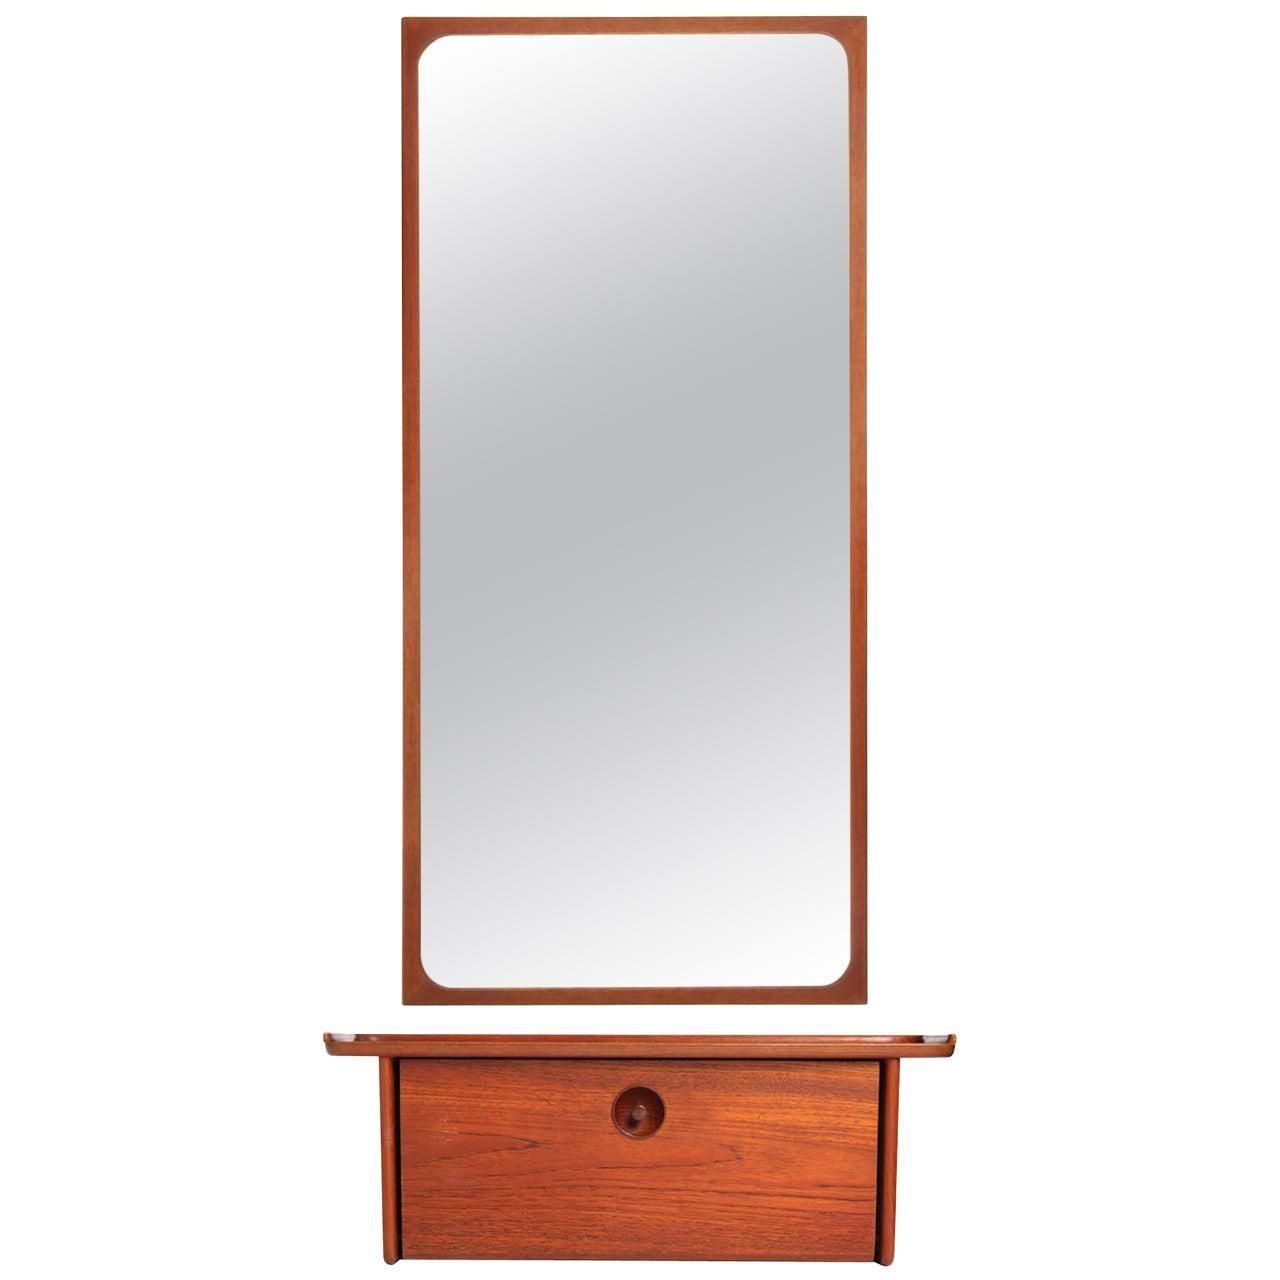 1950s Wall Shelf and Mirror by Ludvig Pontoppidan